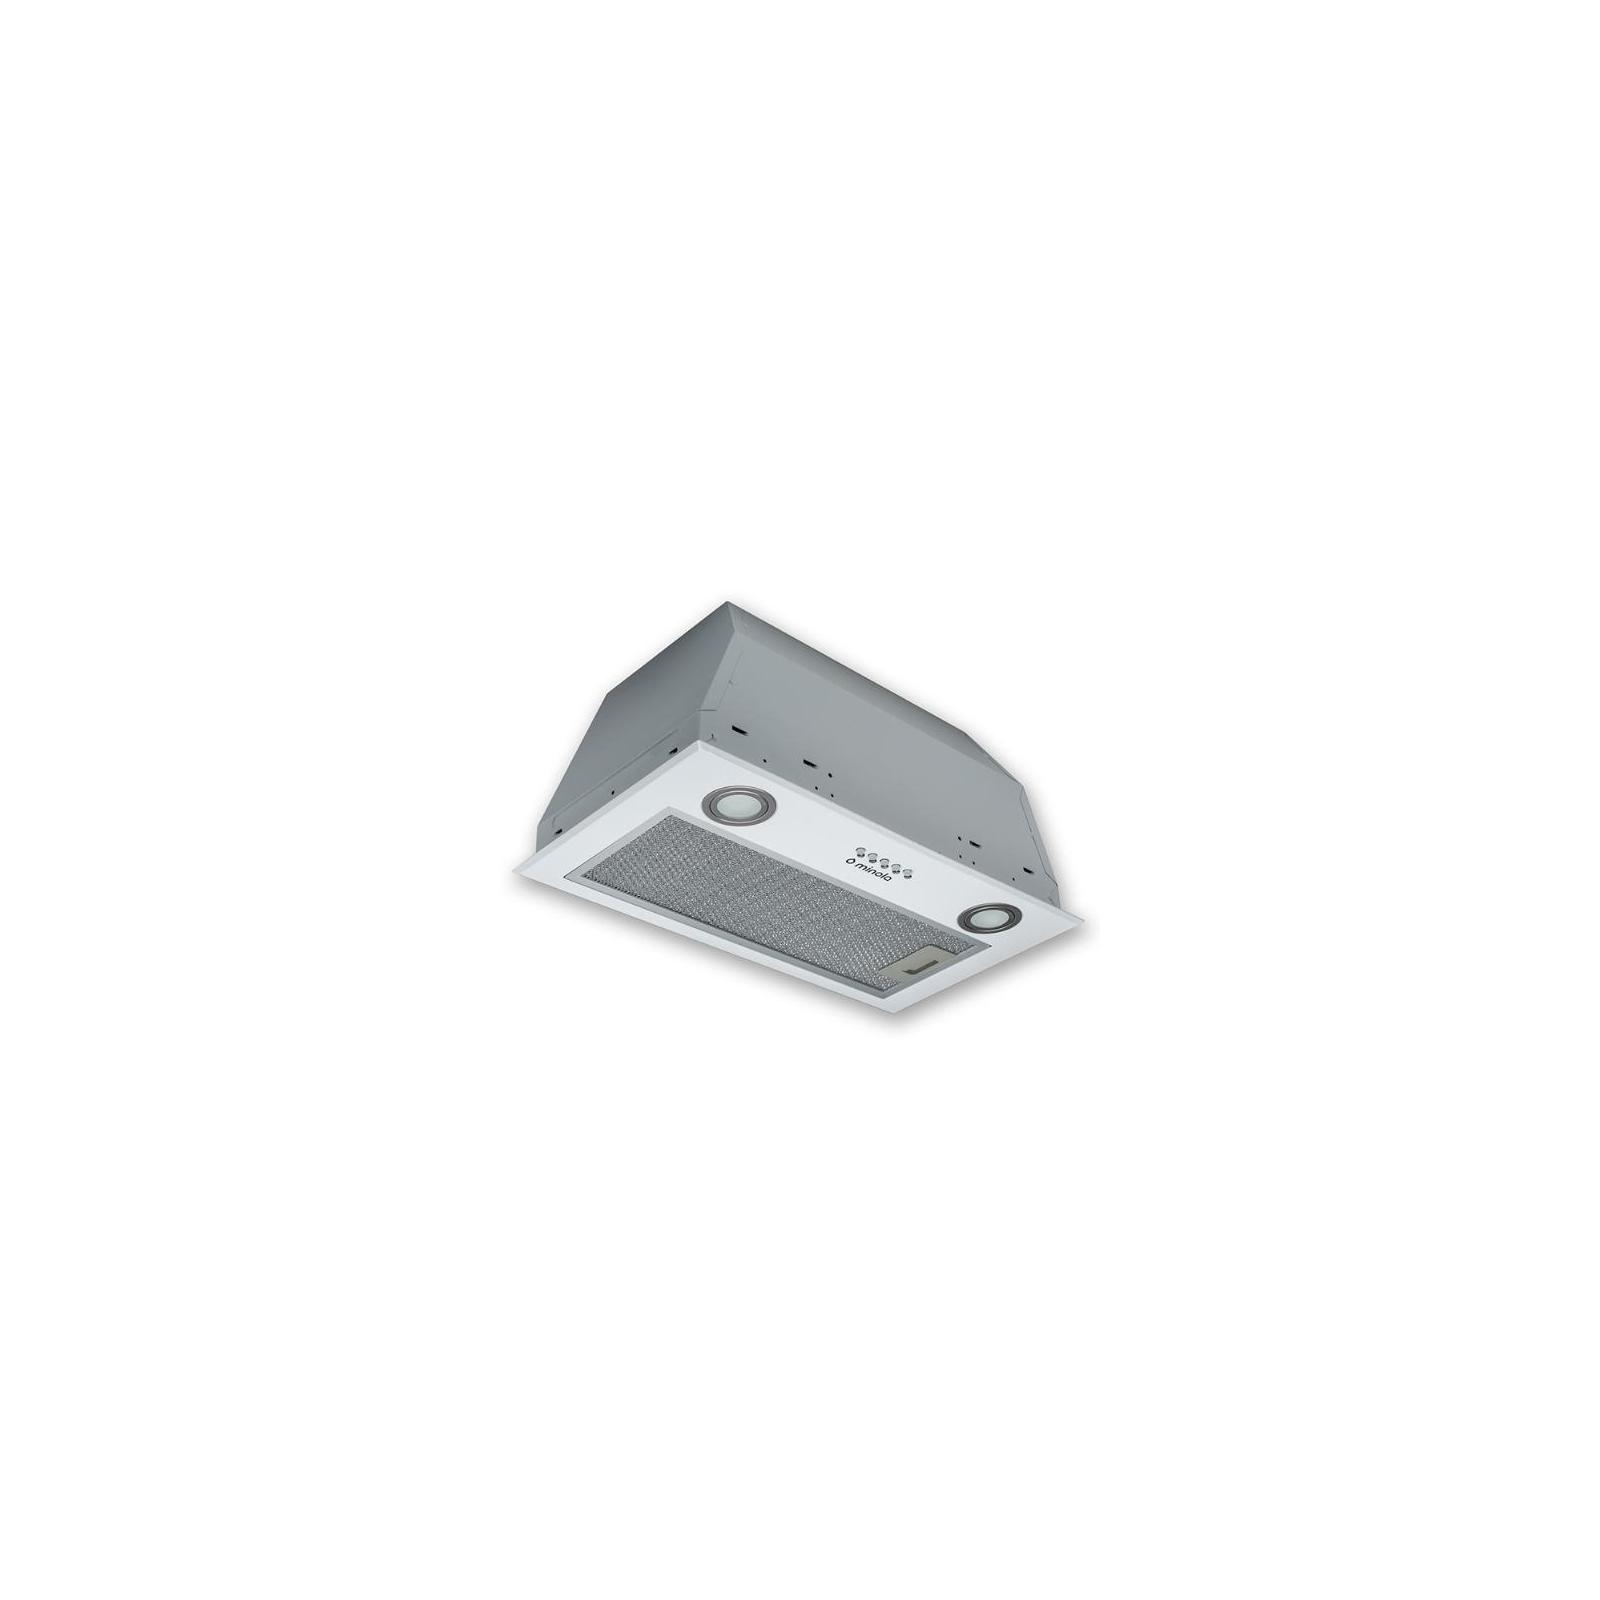 Вытяжка кухонная MINOLA HBI 5822 WH 1200 LED